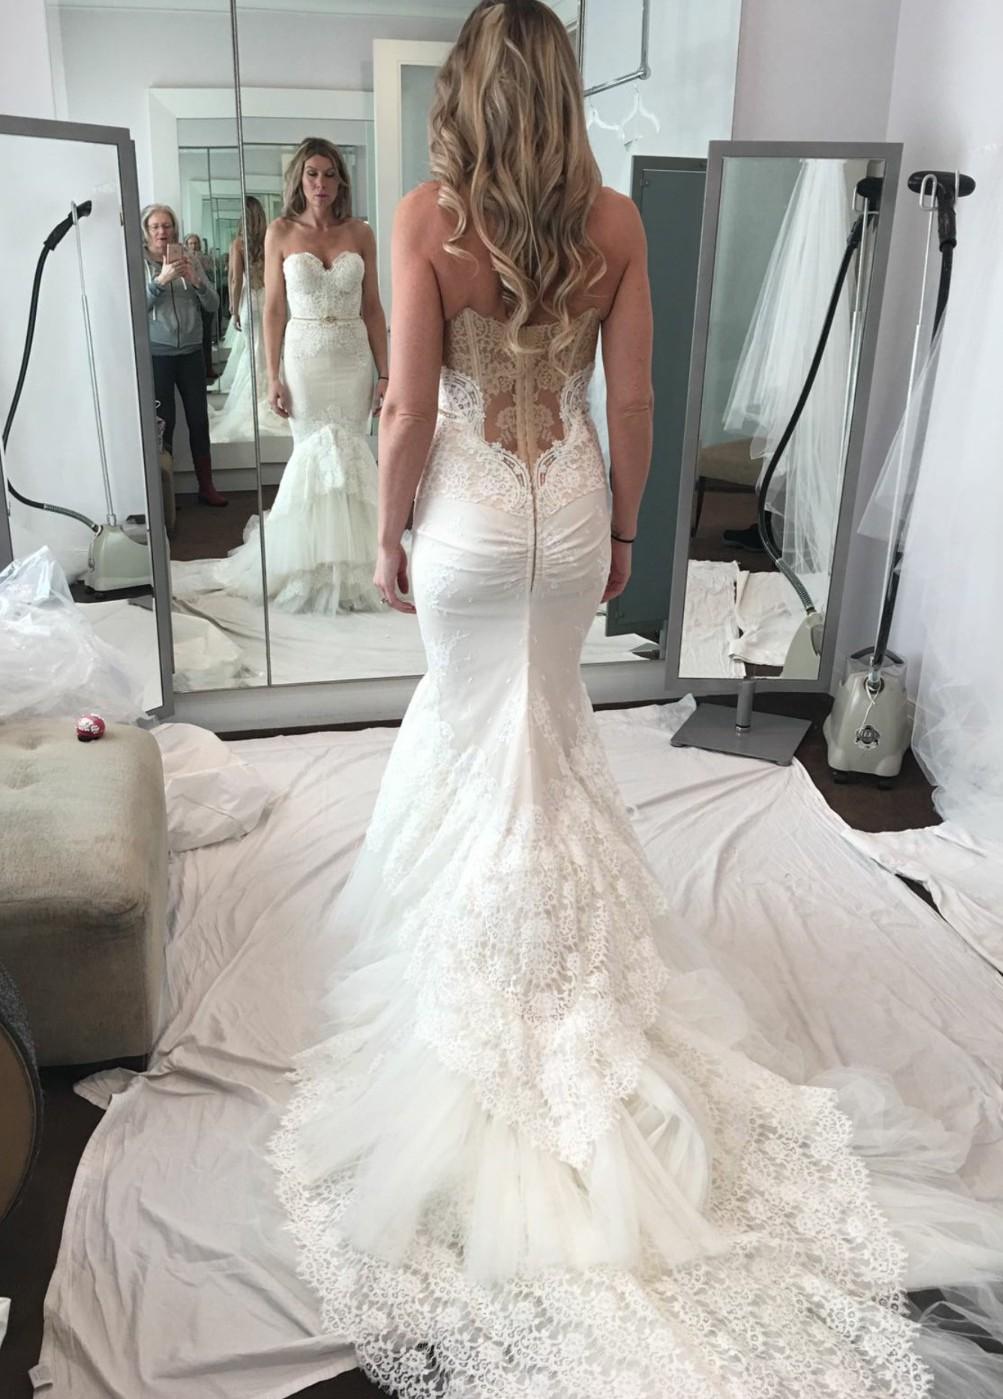 Inbal Dror Vip Second Hand Wedding Dress On Sale 45 Off